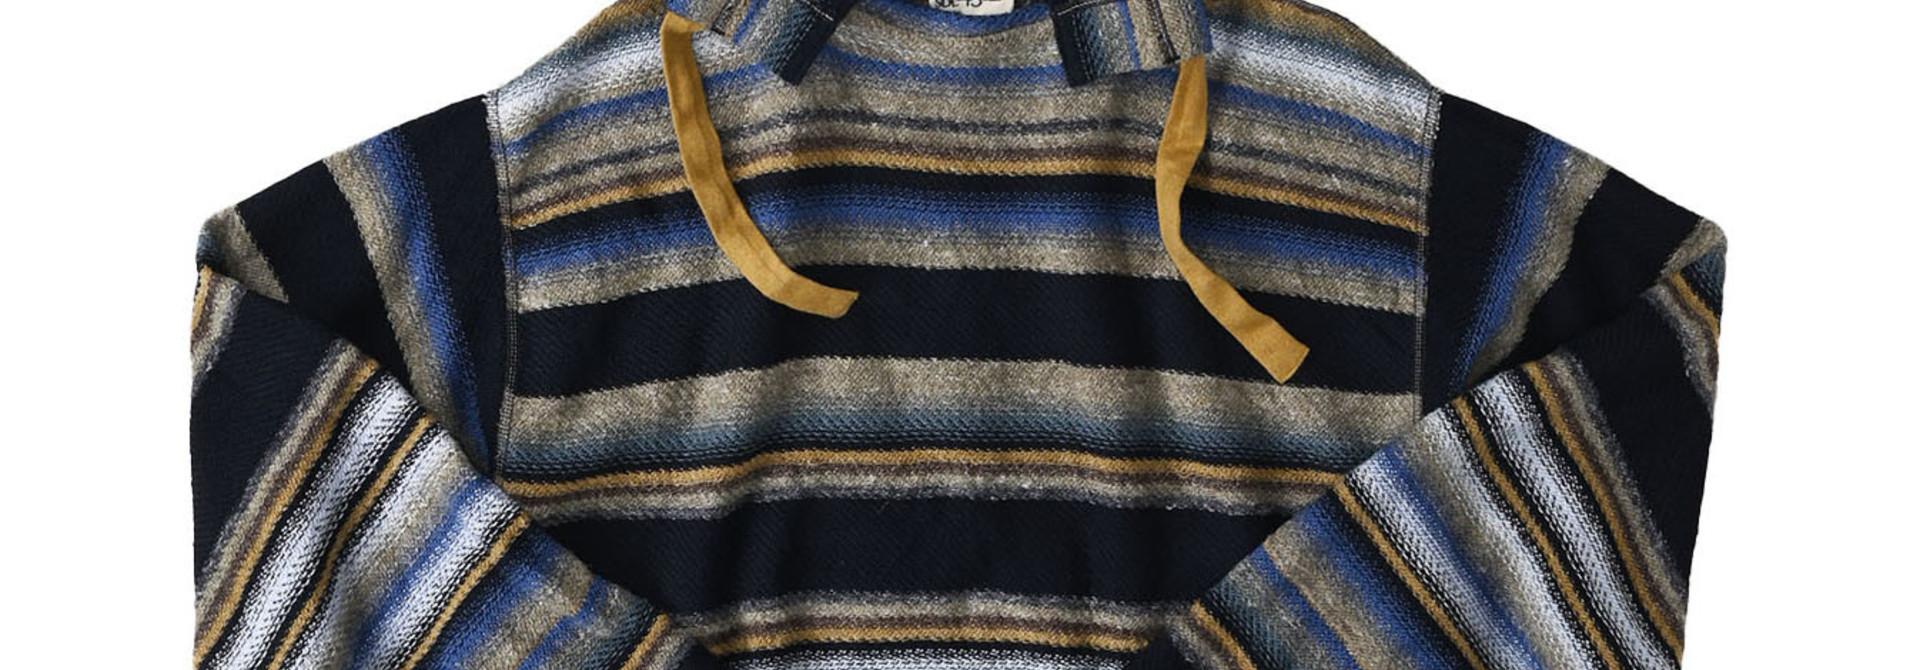 Indigo Rainbow Stripe Knit-sew 908 Umahiko Hoodie (0721)